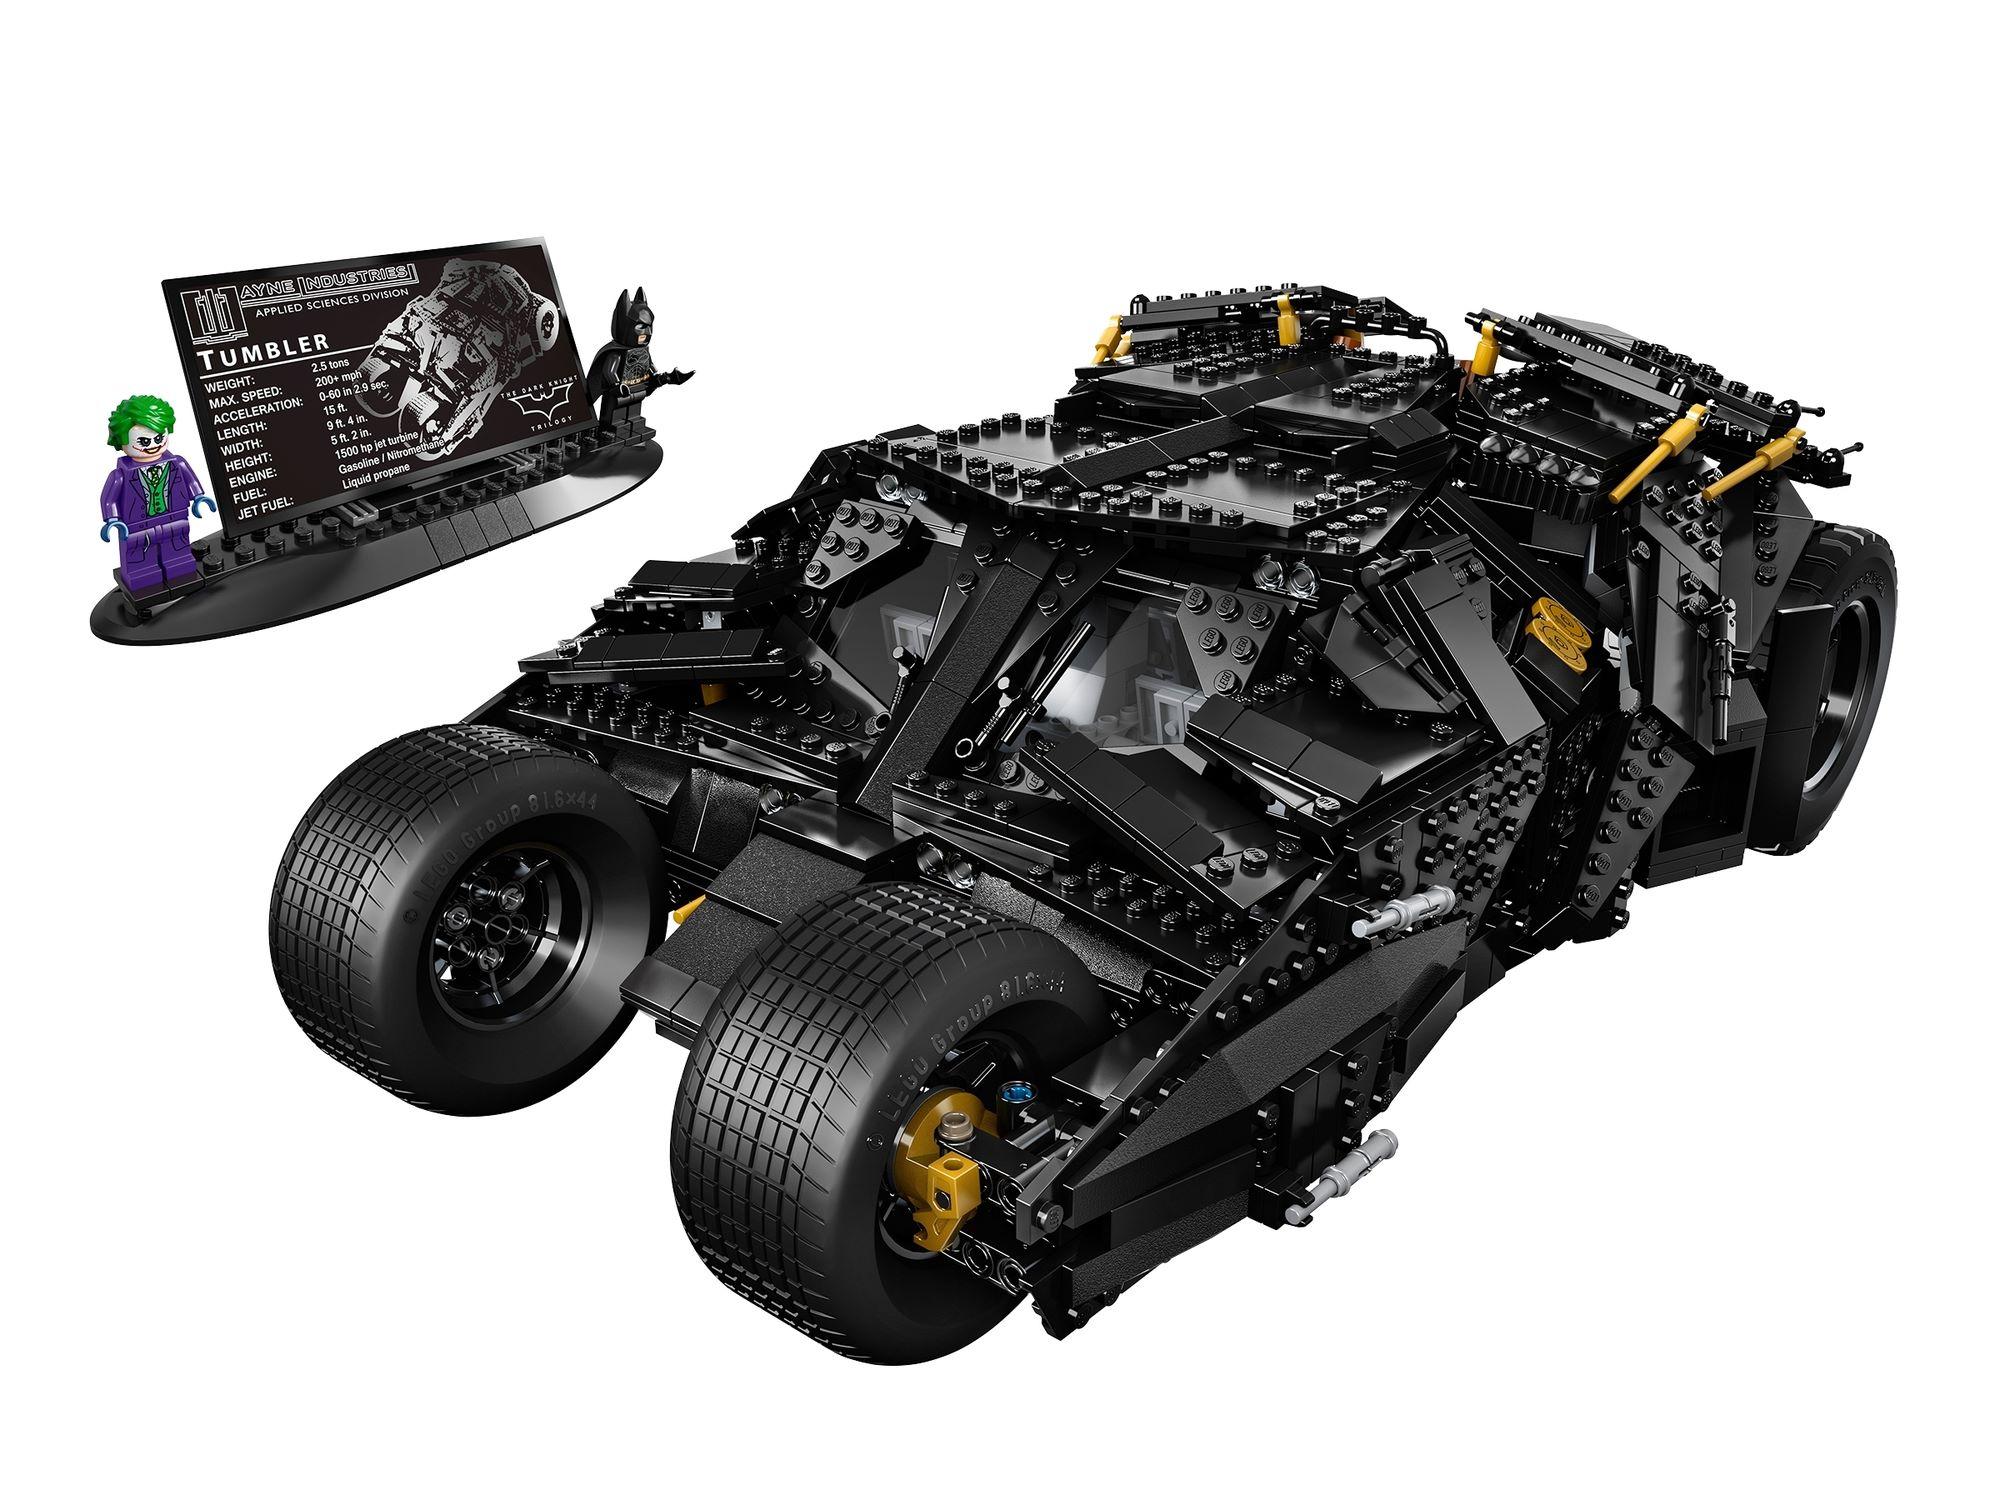 LEGO Dc Super Heroes 76023 The Tumbler 1